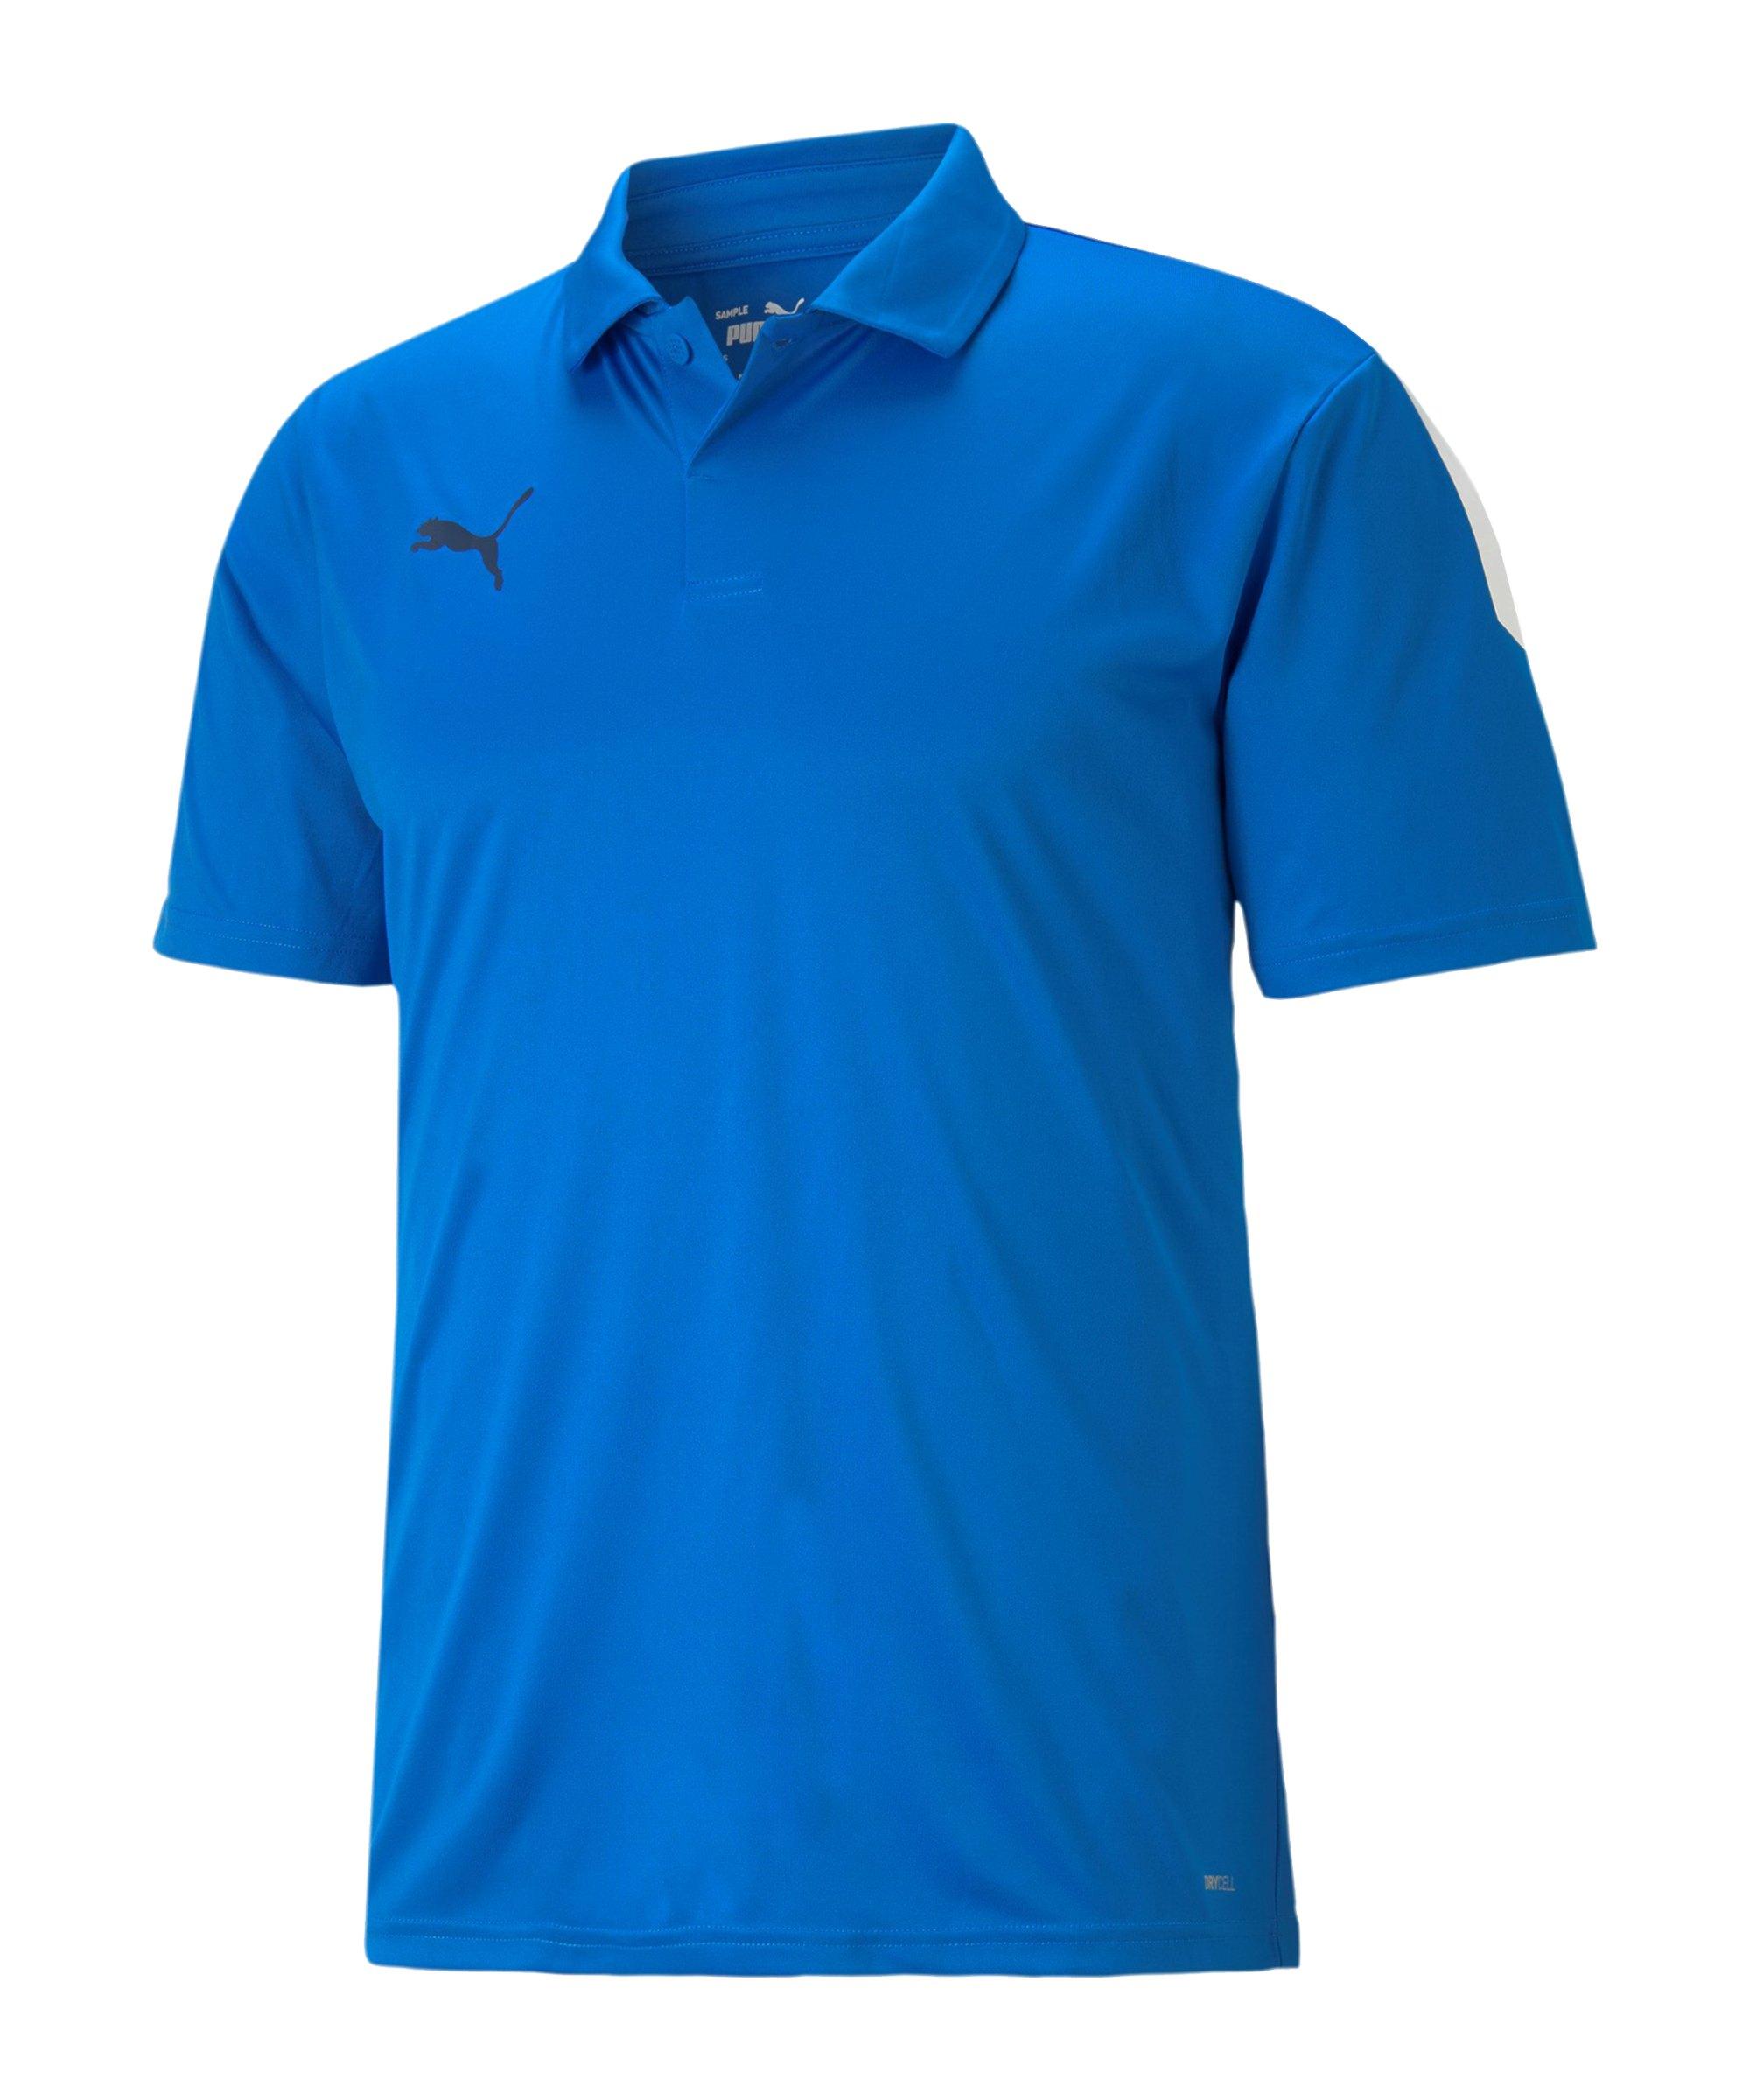 PUMA teamLIGA Sideline Polo Blau F02 - blau